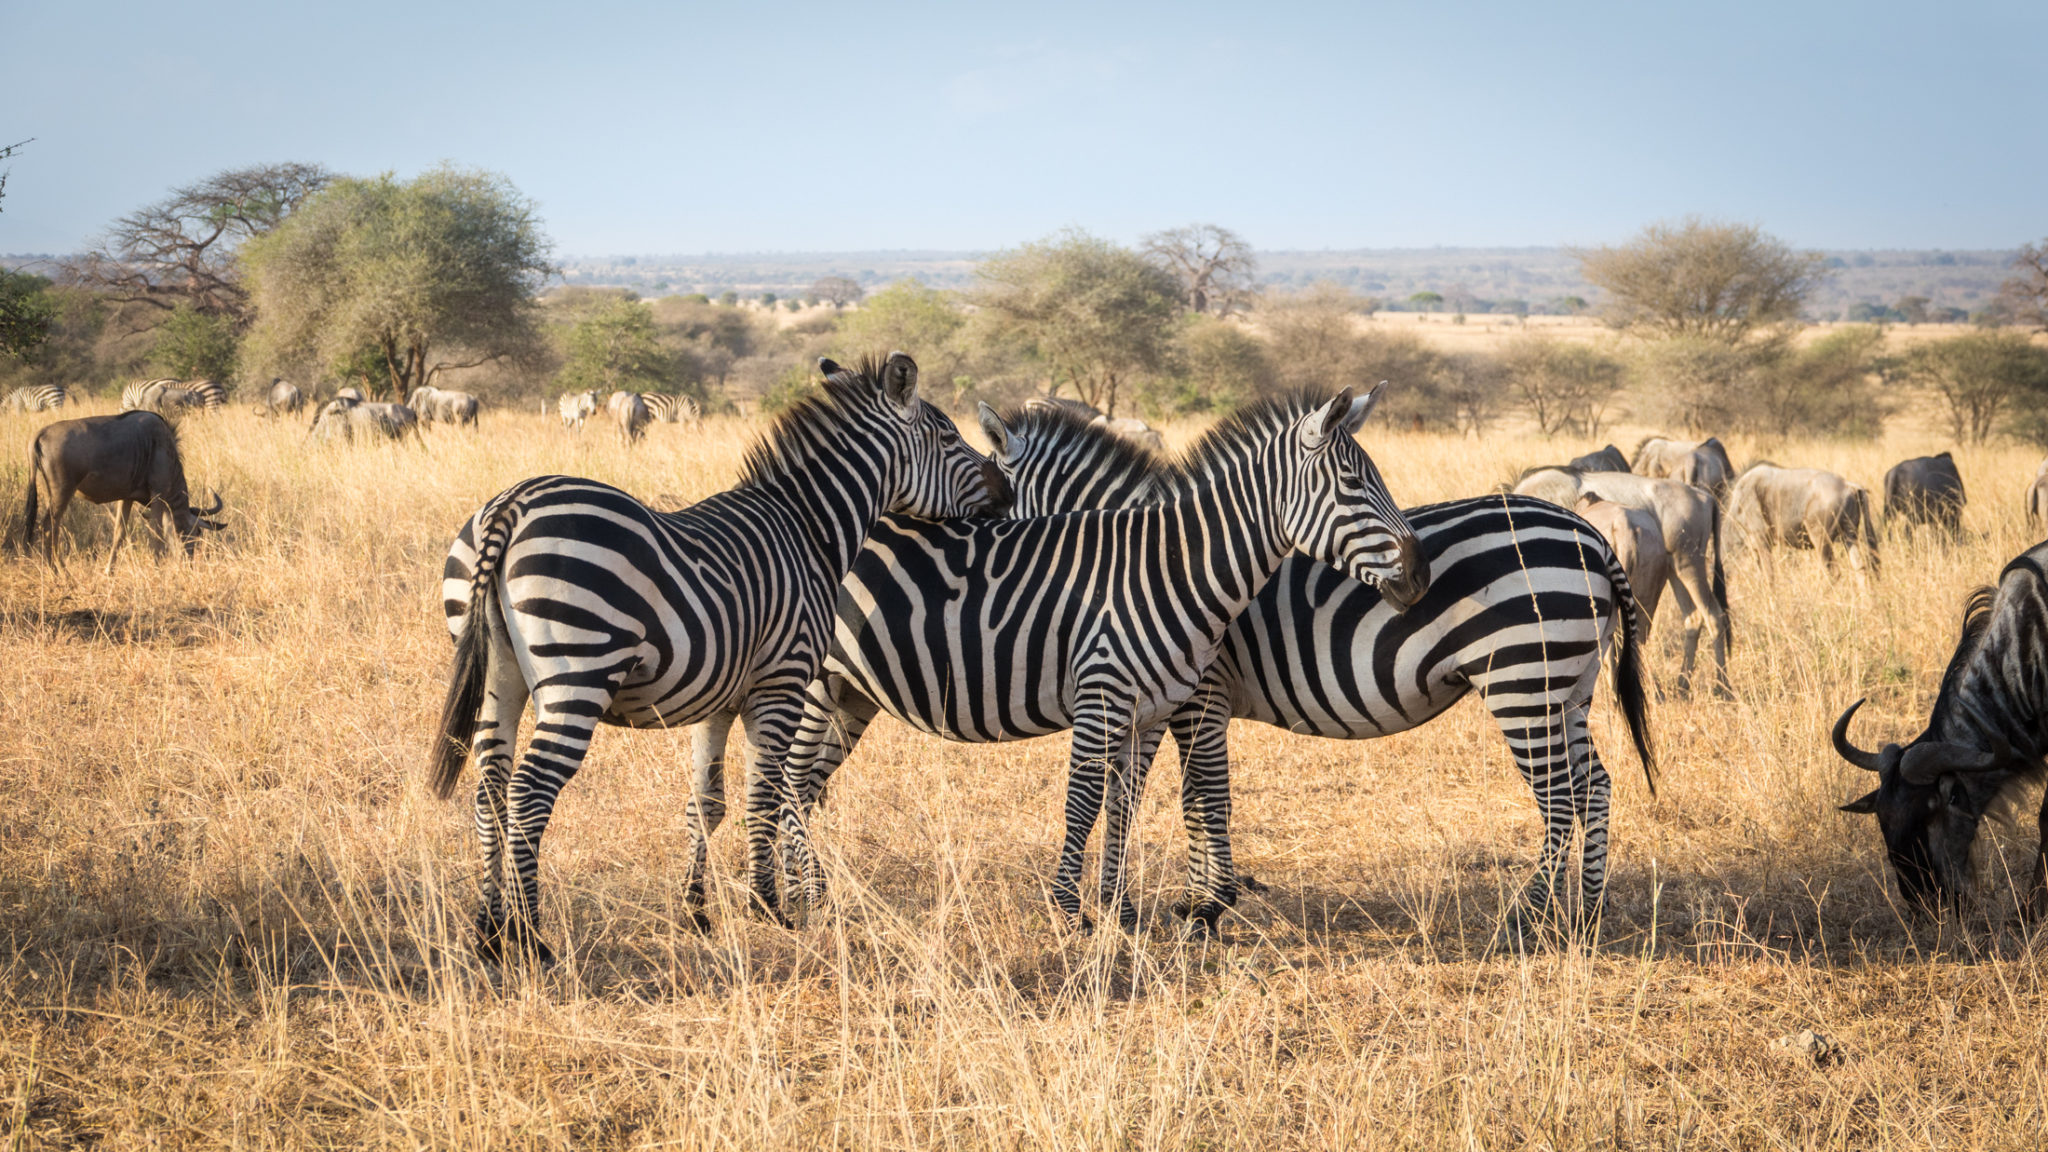 Gnus und Zebras im Tarangire Nationalpark, Tansania